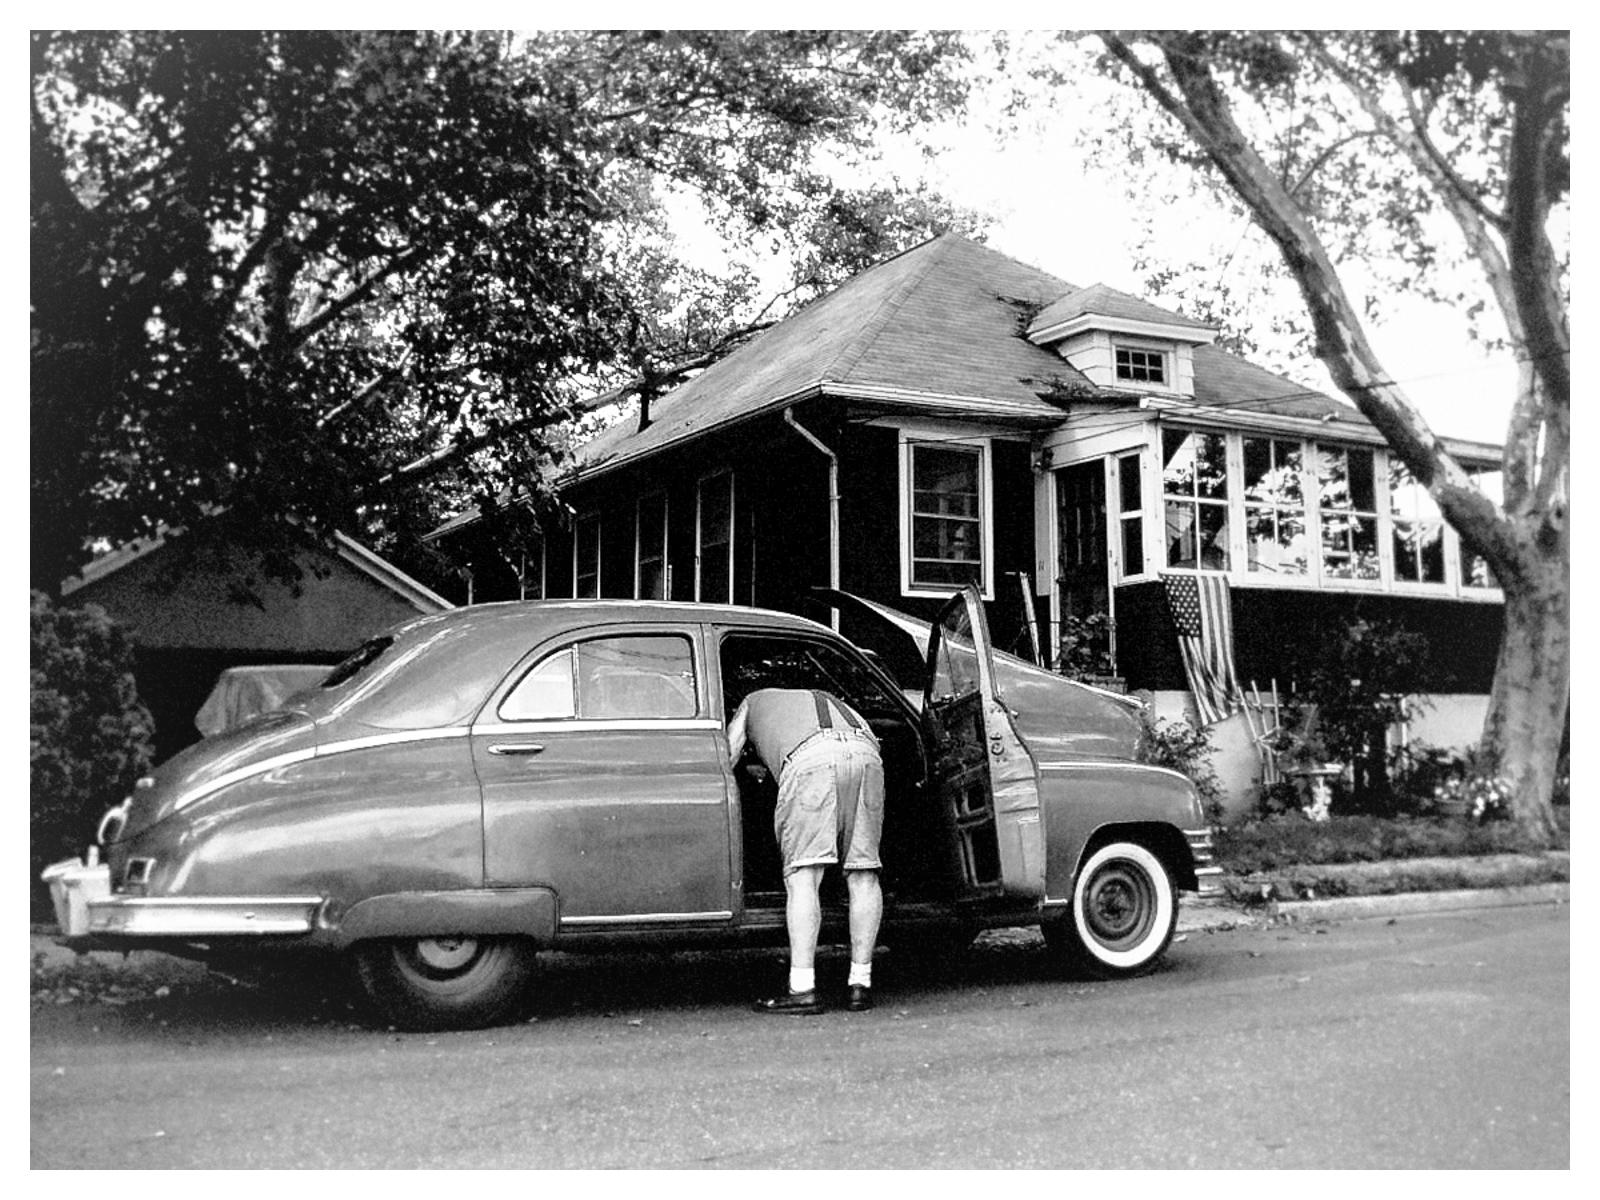 NY Photography Americana Vintage Black And White Old Car